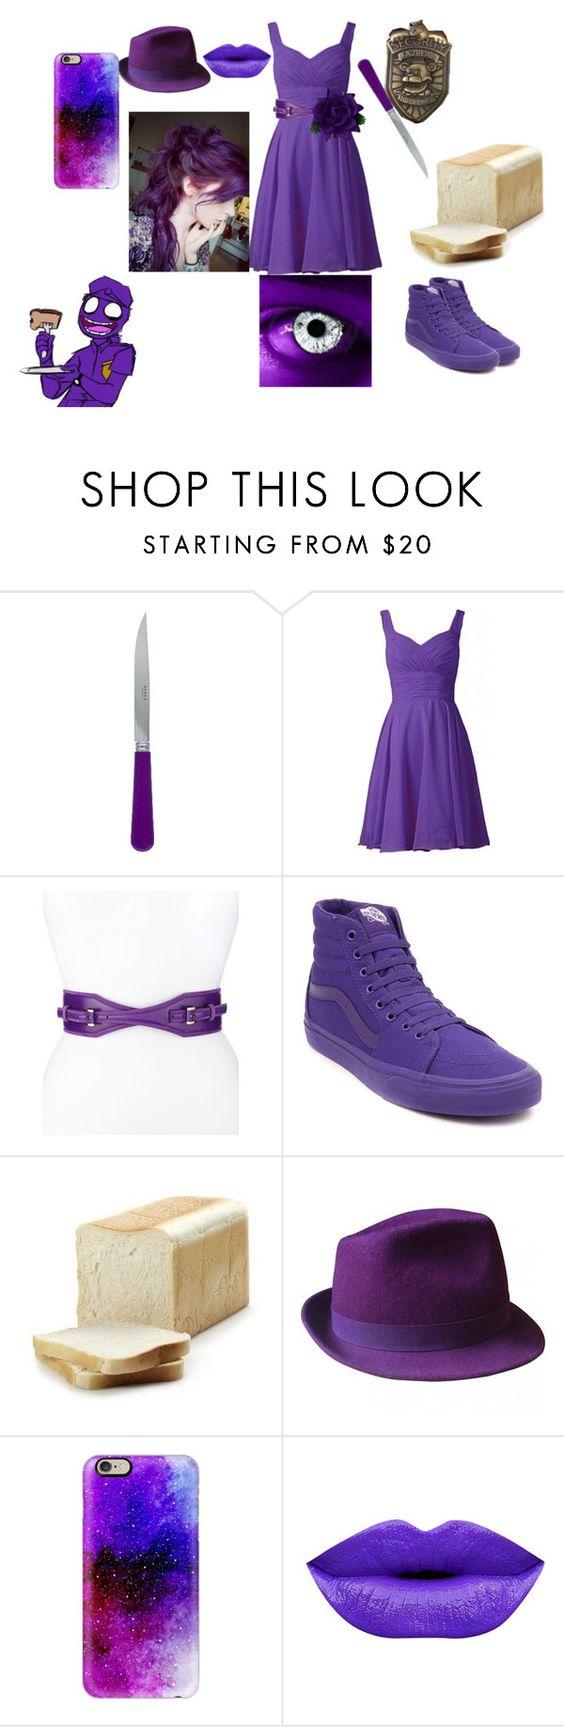 """fnaf purple girl"" by minecrafterfoxkol ❤ liked on Polyvore featuring Sabre, Freddy, Oscar de la Renta, Vans, Gérard Darel and Casetify"